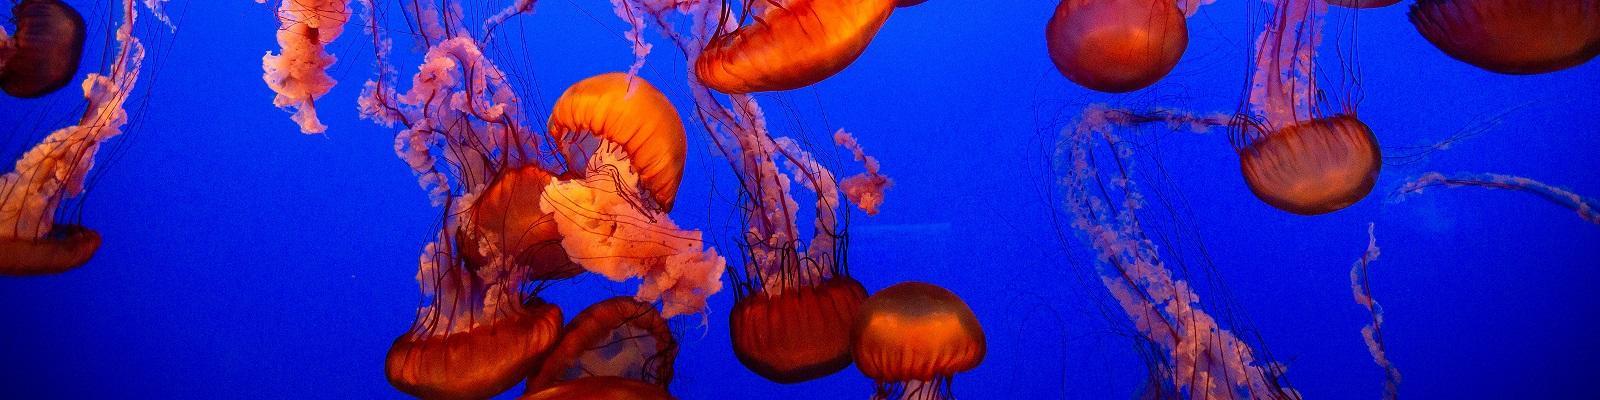 Jellyfish up-close at the Monterey Bay Aquarium in Monterey, California